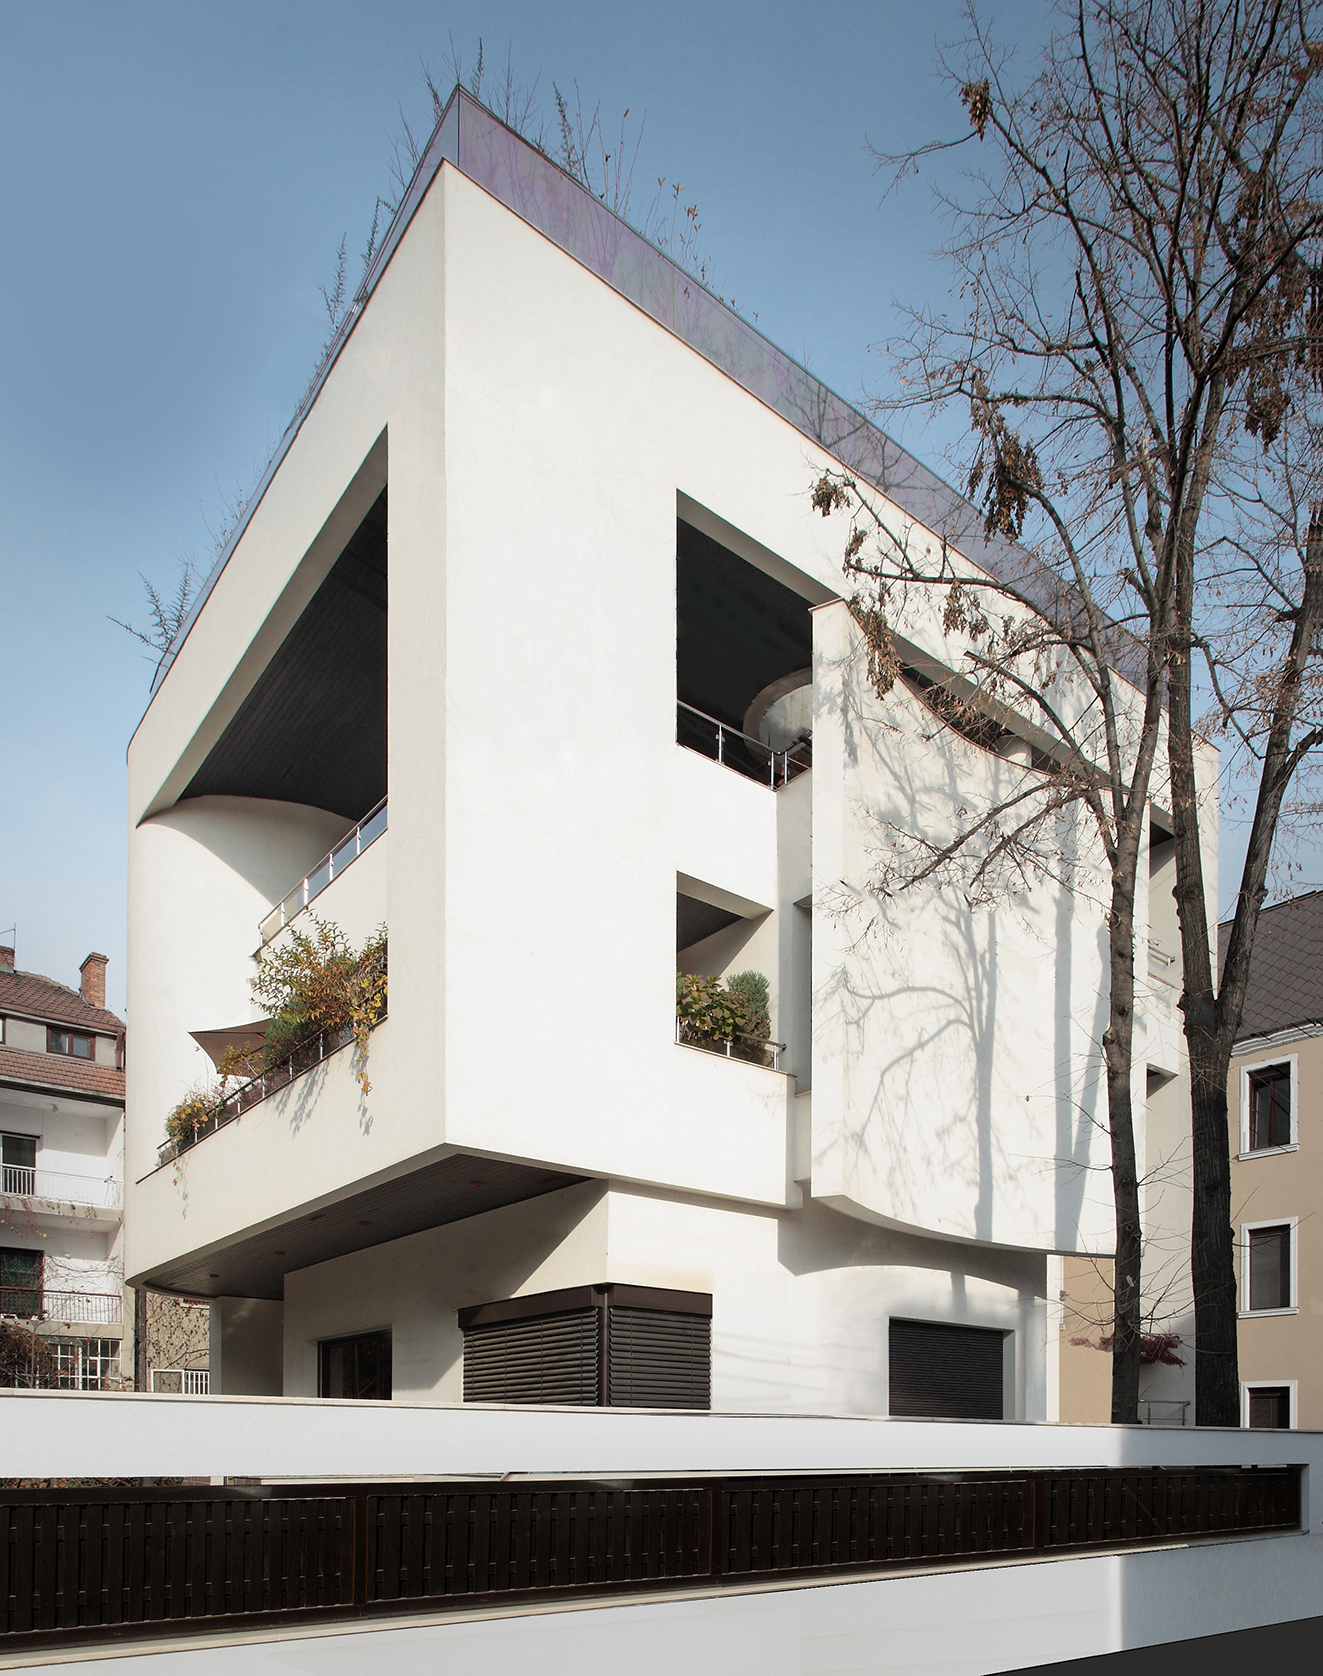 https://nbc-arhitect.ro/wp-content/uploads/2020/10/NBC-Arhitect-_-Cube-House-_-Bucharest-Romania-_-view-exterior_2.jpg